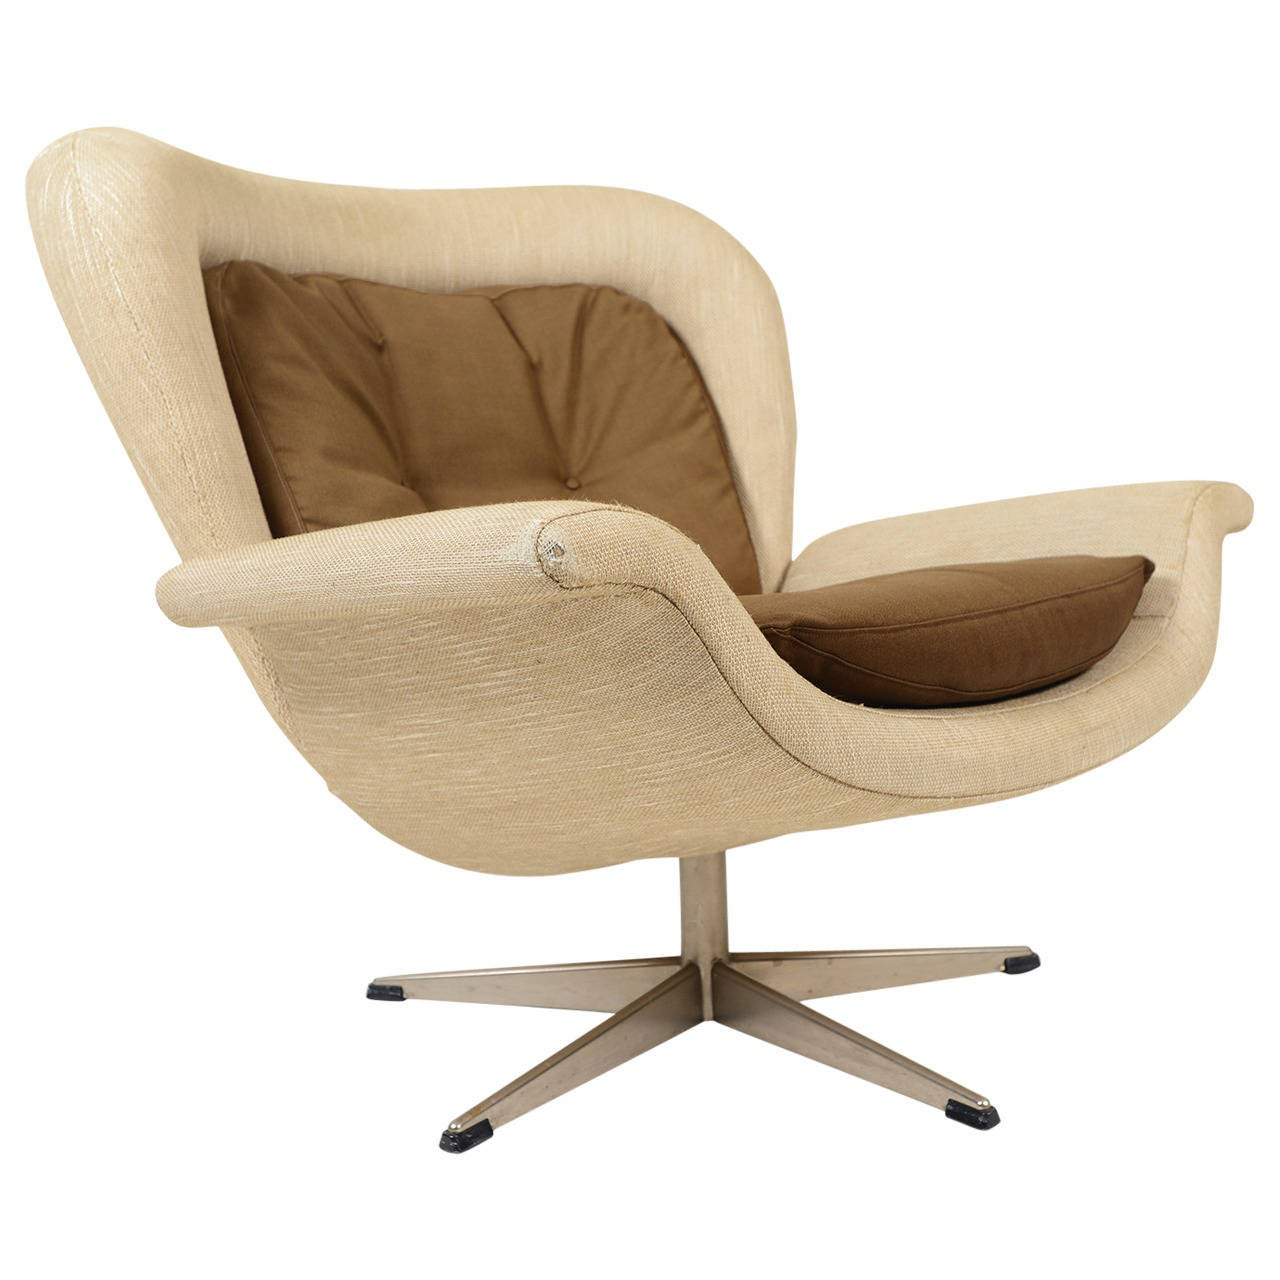 John Mortensen Prototype Swivel Lounge Chair For Sale At